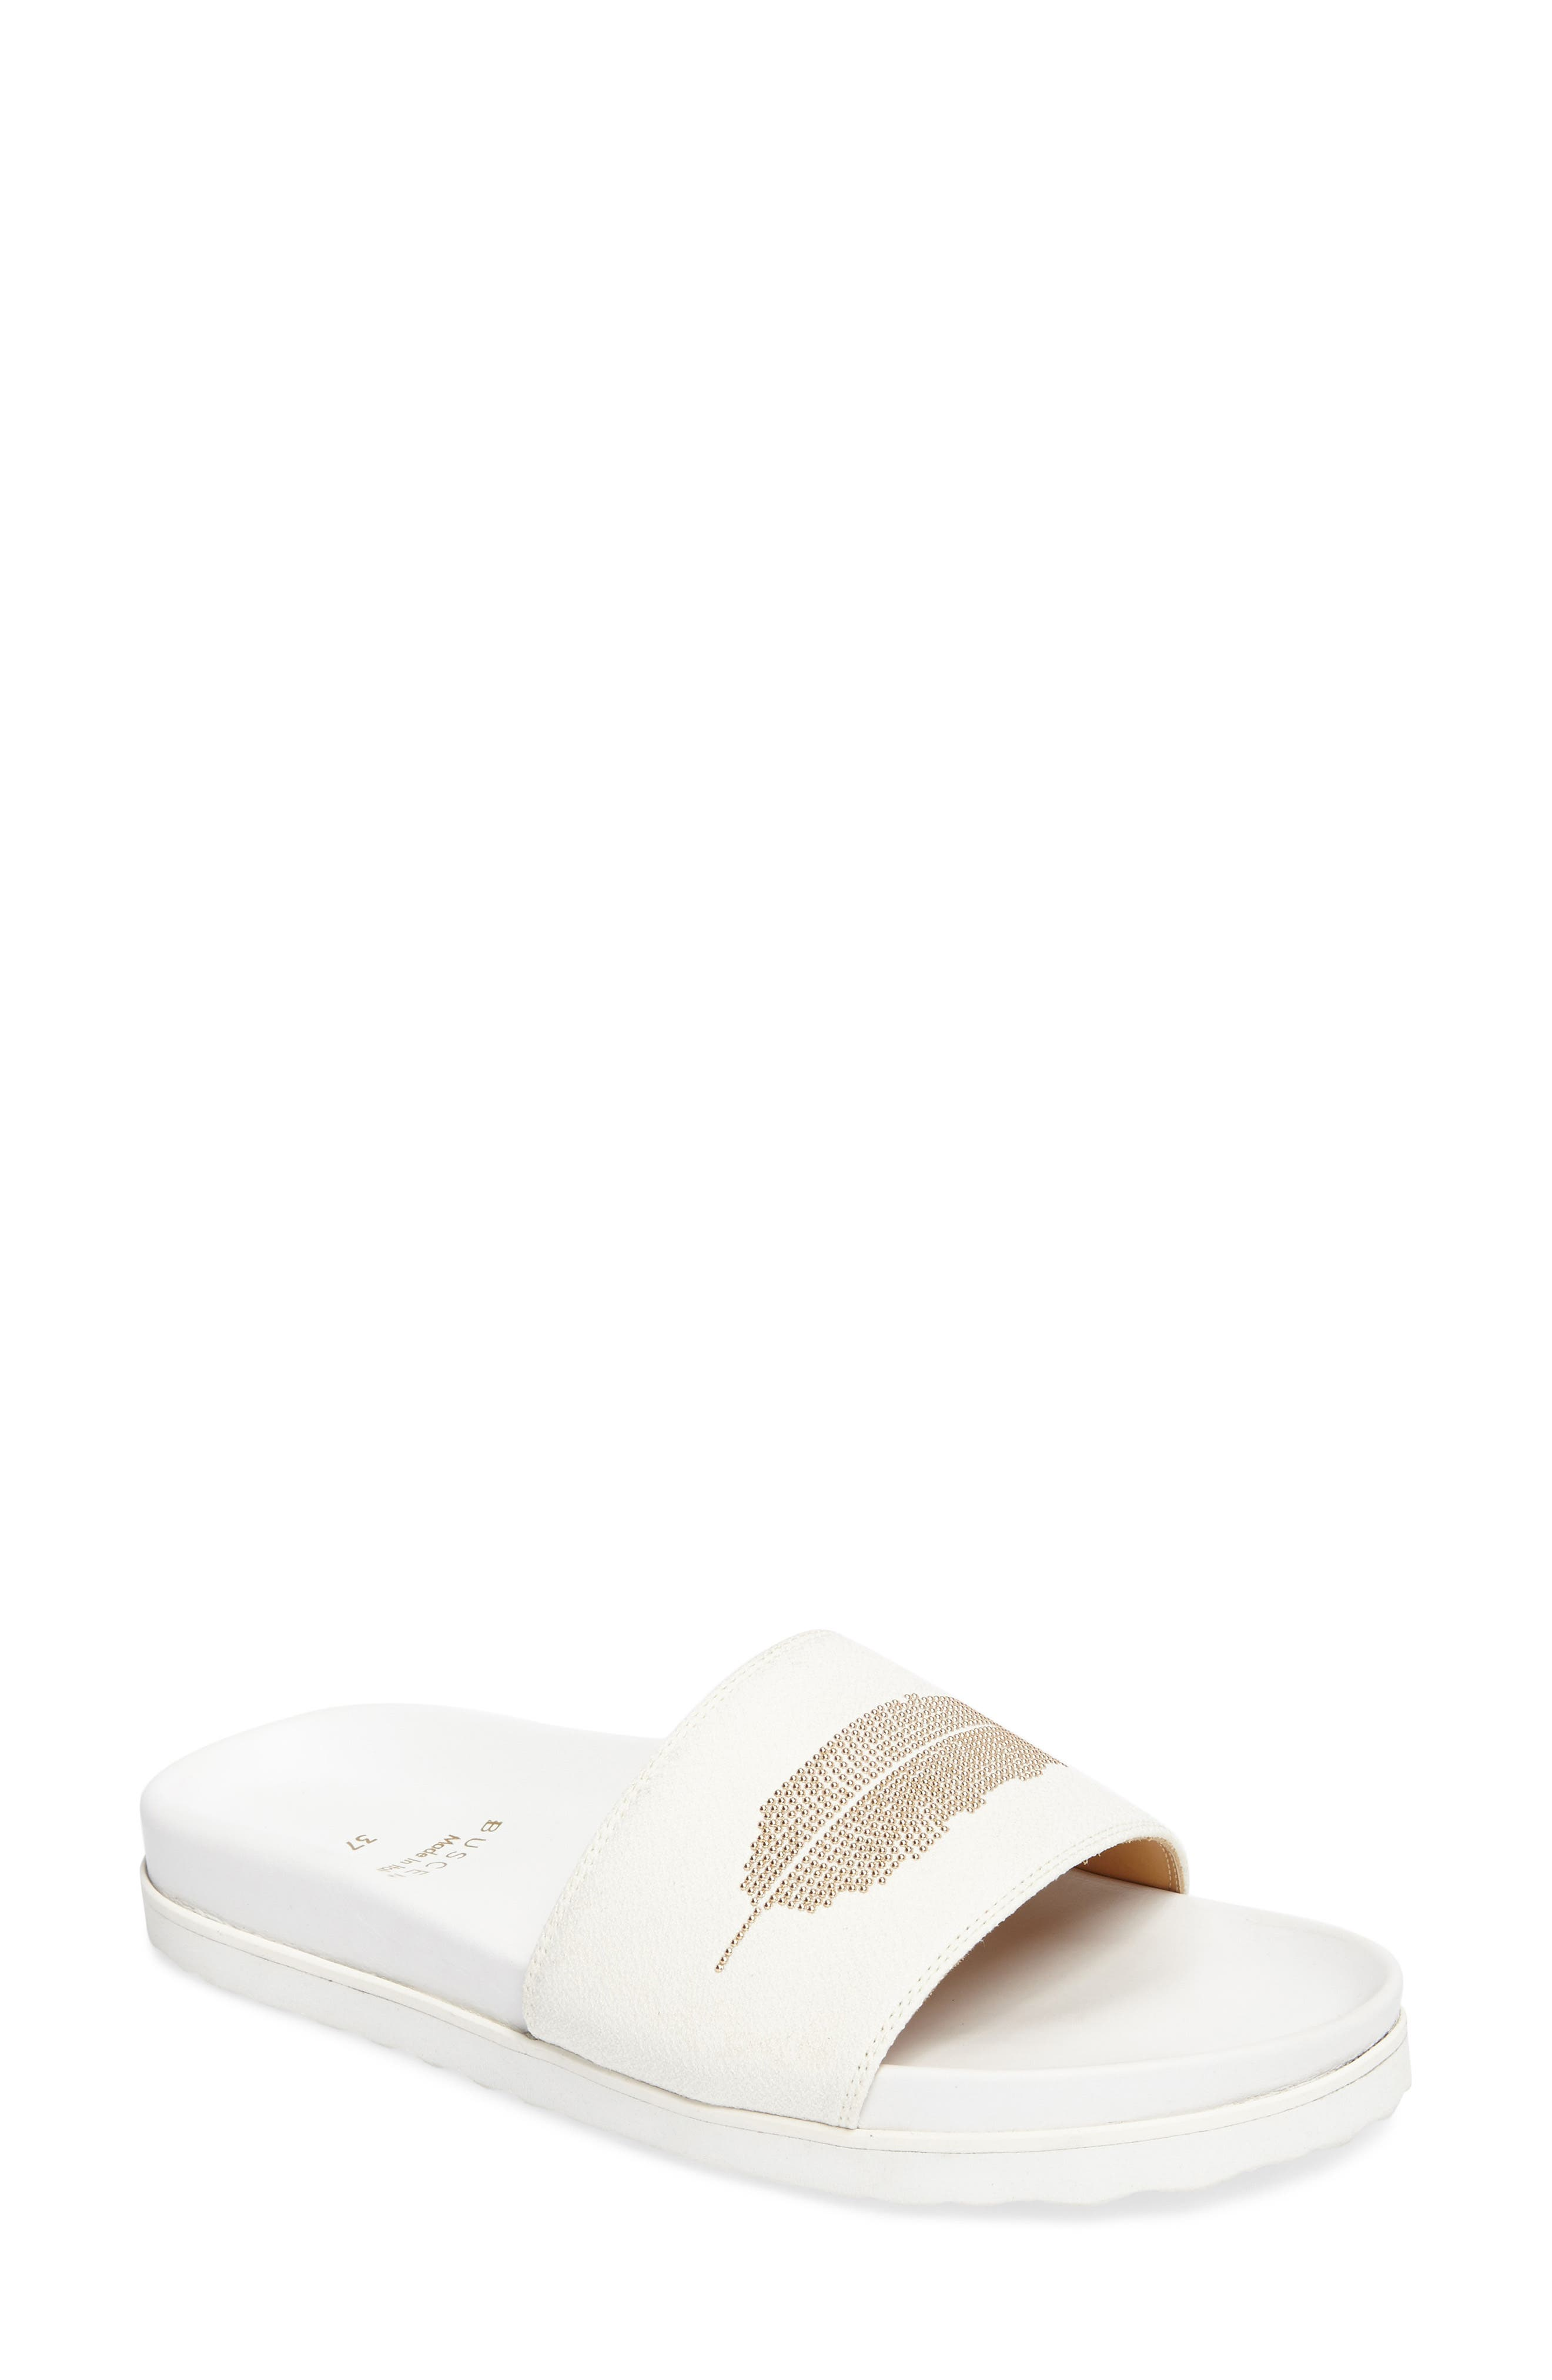 Buscemi Crepone Feather Slide Sandal (Women)